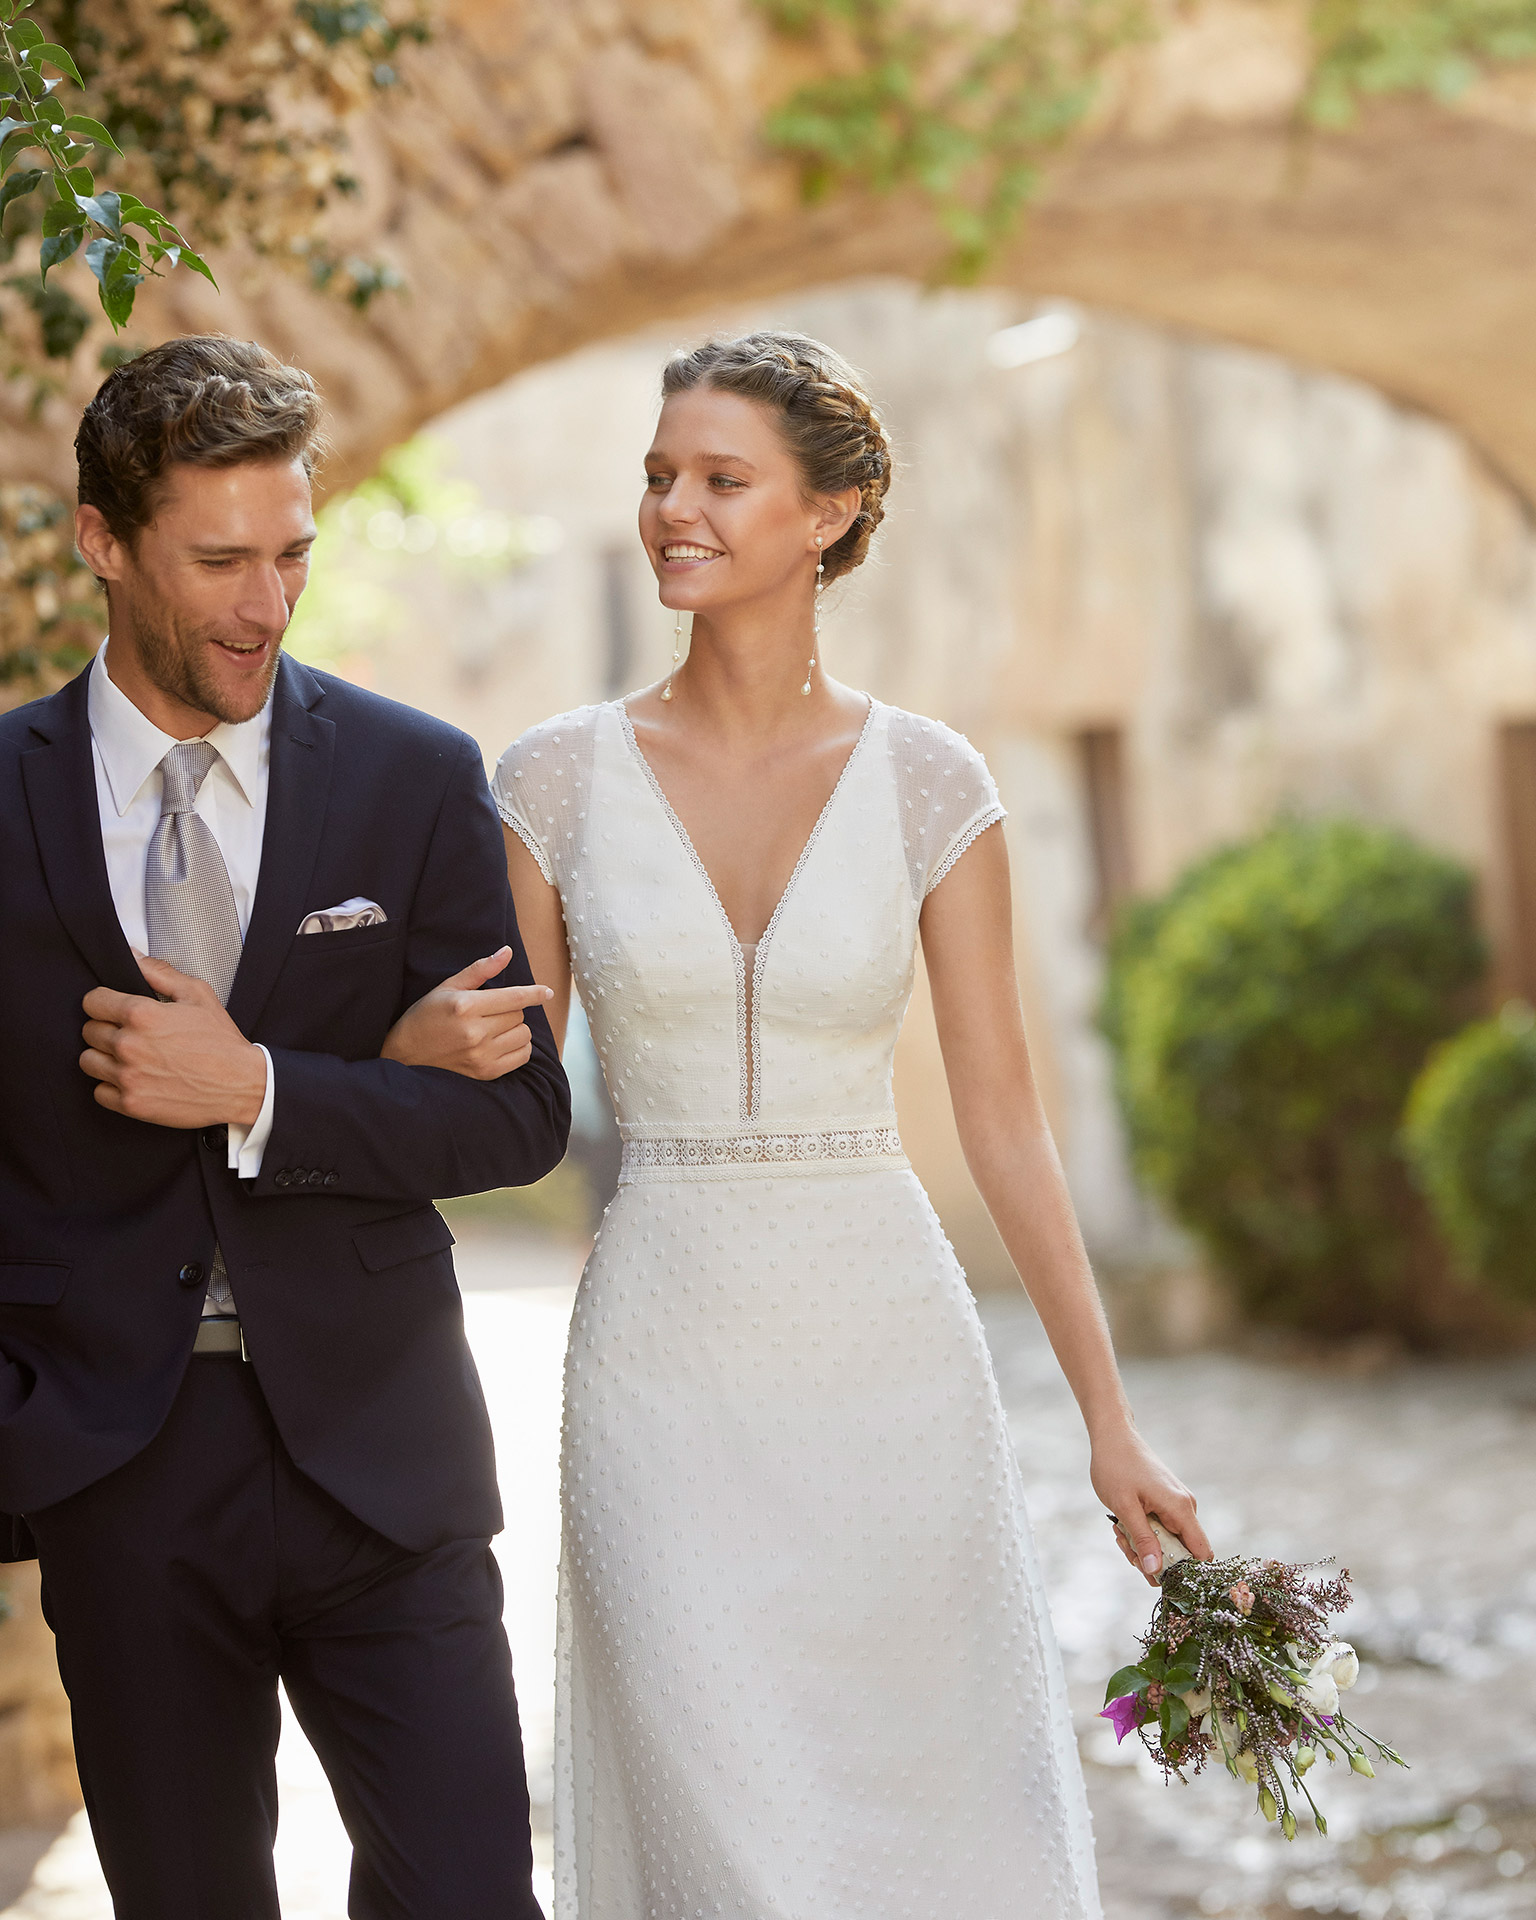 Boho-chic sheath-style wedding dress; with V-neckline, closed back and raglan sleeves. Unique Alma Novia model in polka-dot chiffon. 2022 ALMANOVIA Collection.